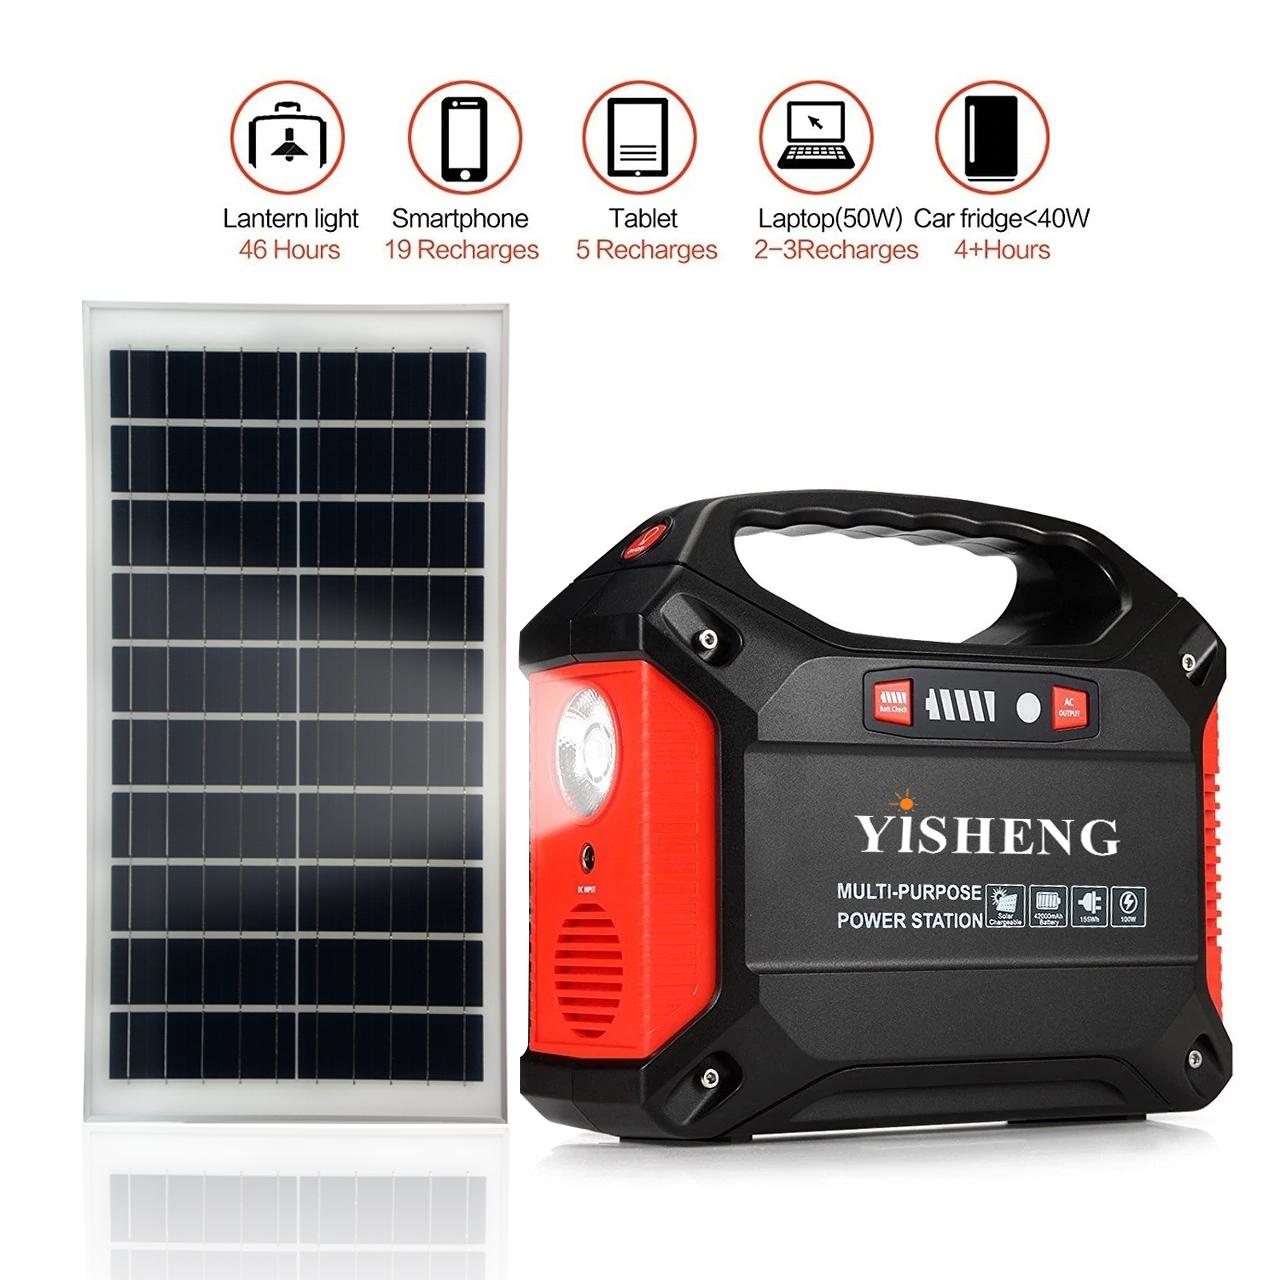 Multi-funktionale Batterie Backup DC5V DC12V Power Bank, AC110V 220V 240V Tragbare Solar Generator Station Notfall Power Pack